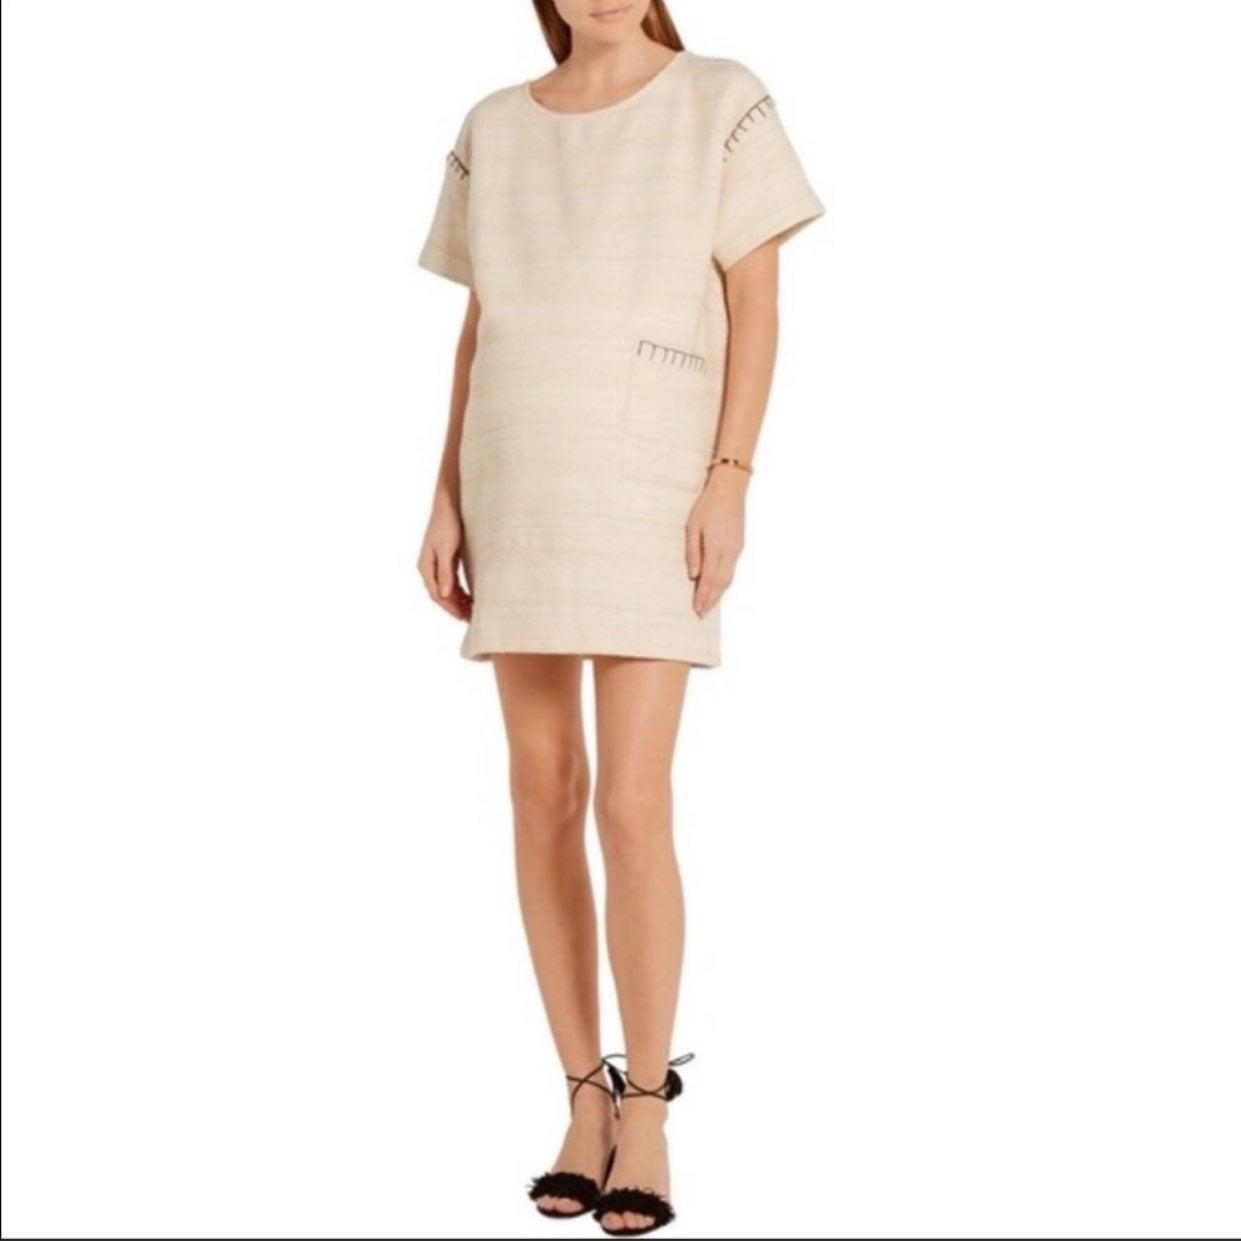 Hatch maternity Naomi ivory tweed dress